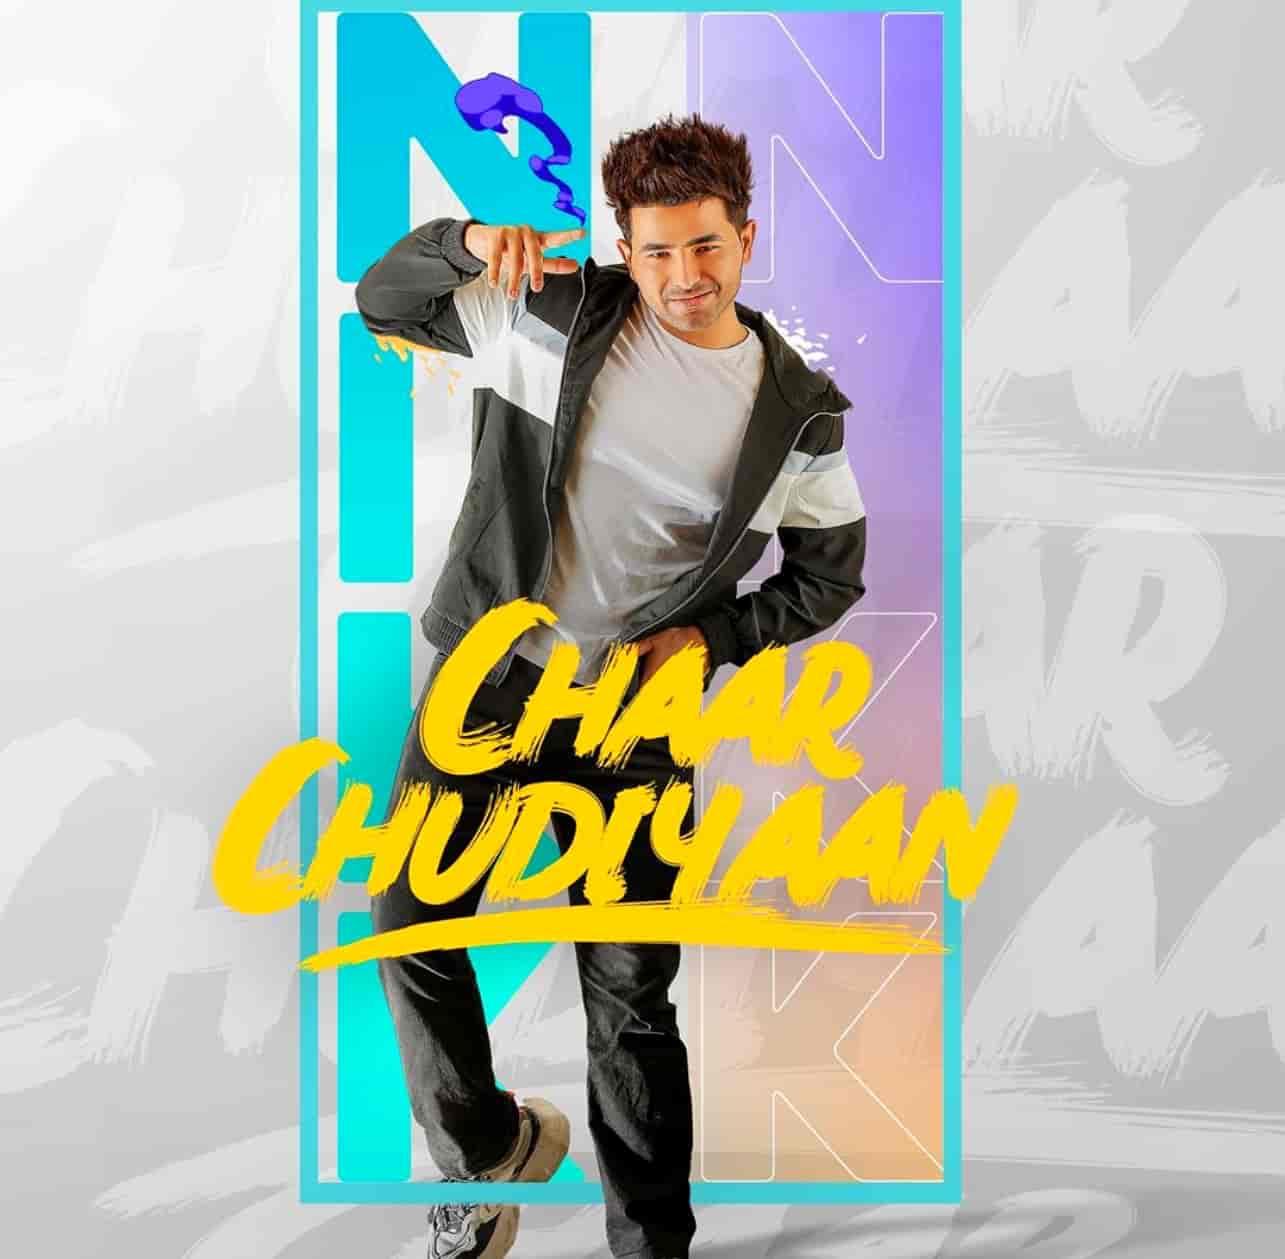 Chaar Chudiyaan Song Images By Nikk